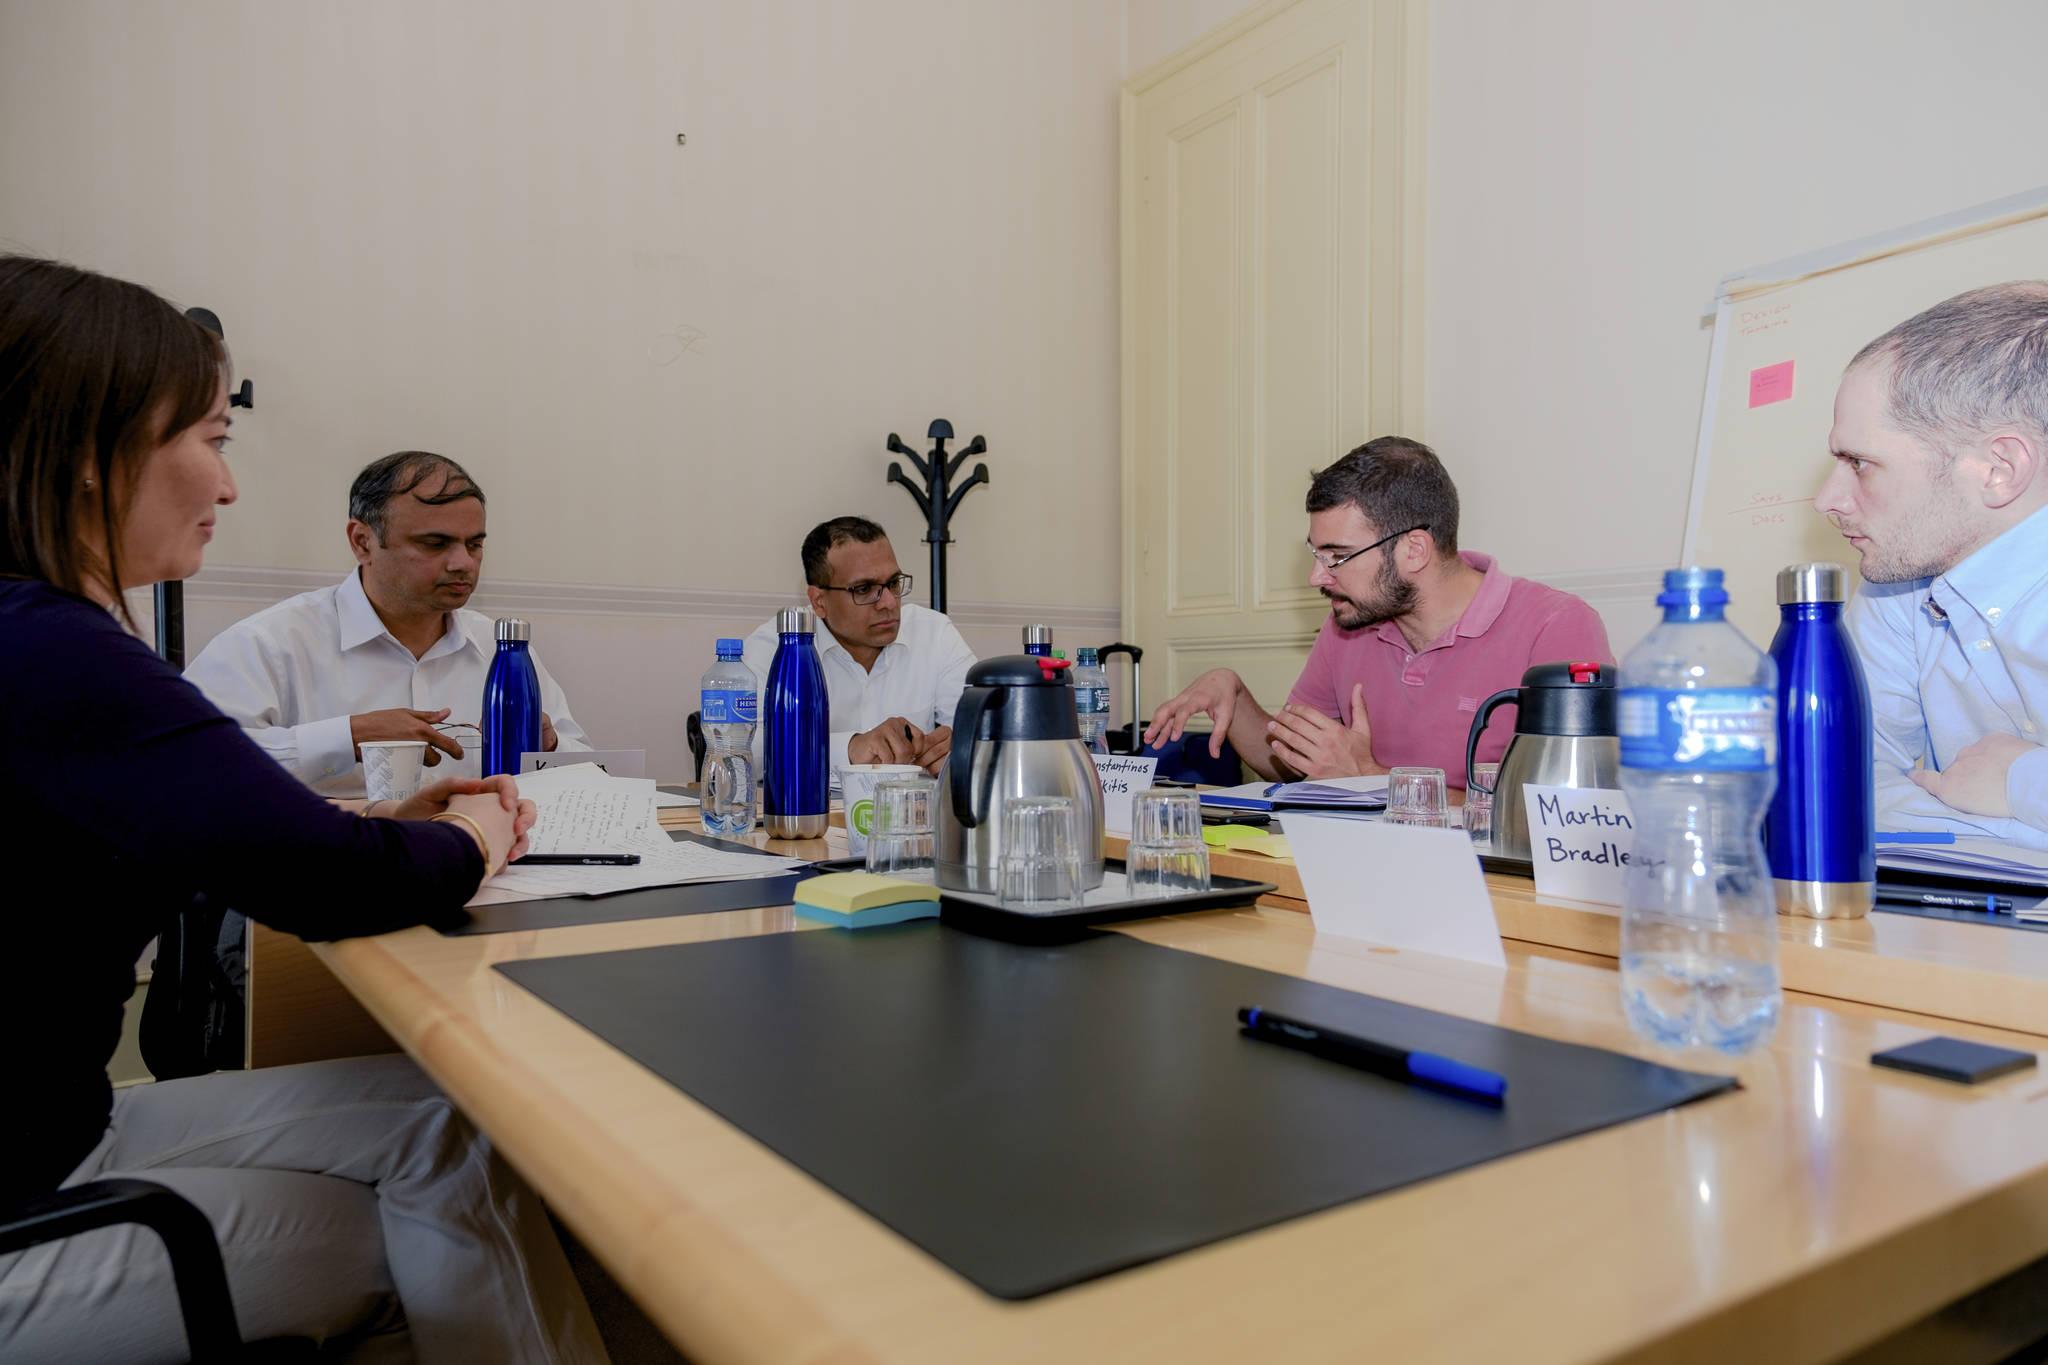 konstantinos team at geneva working